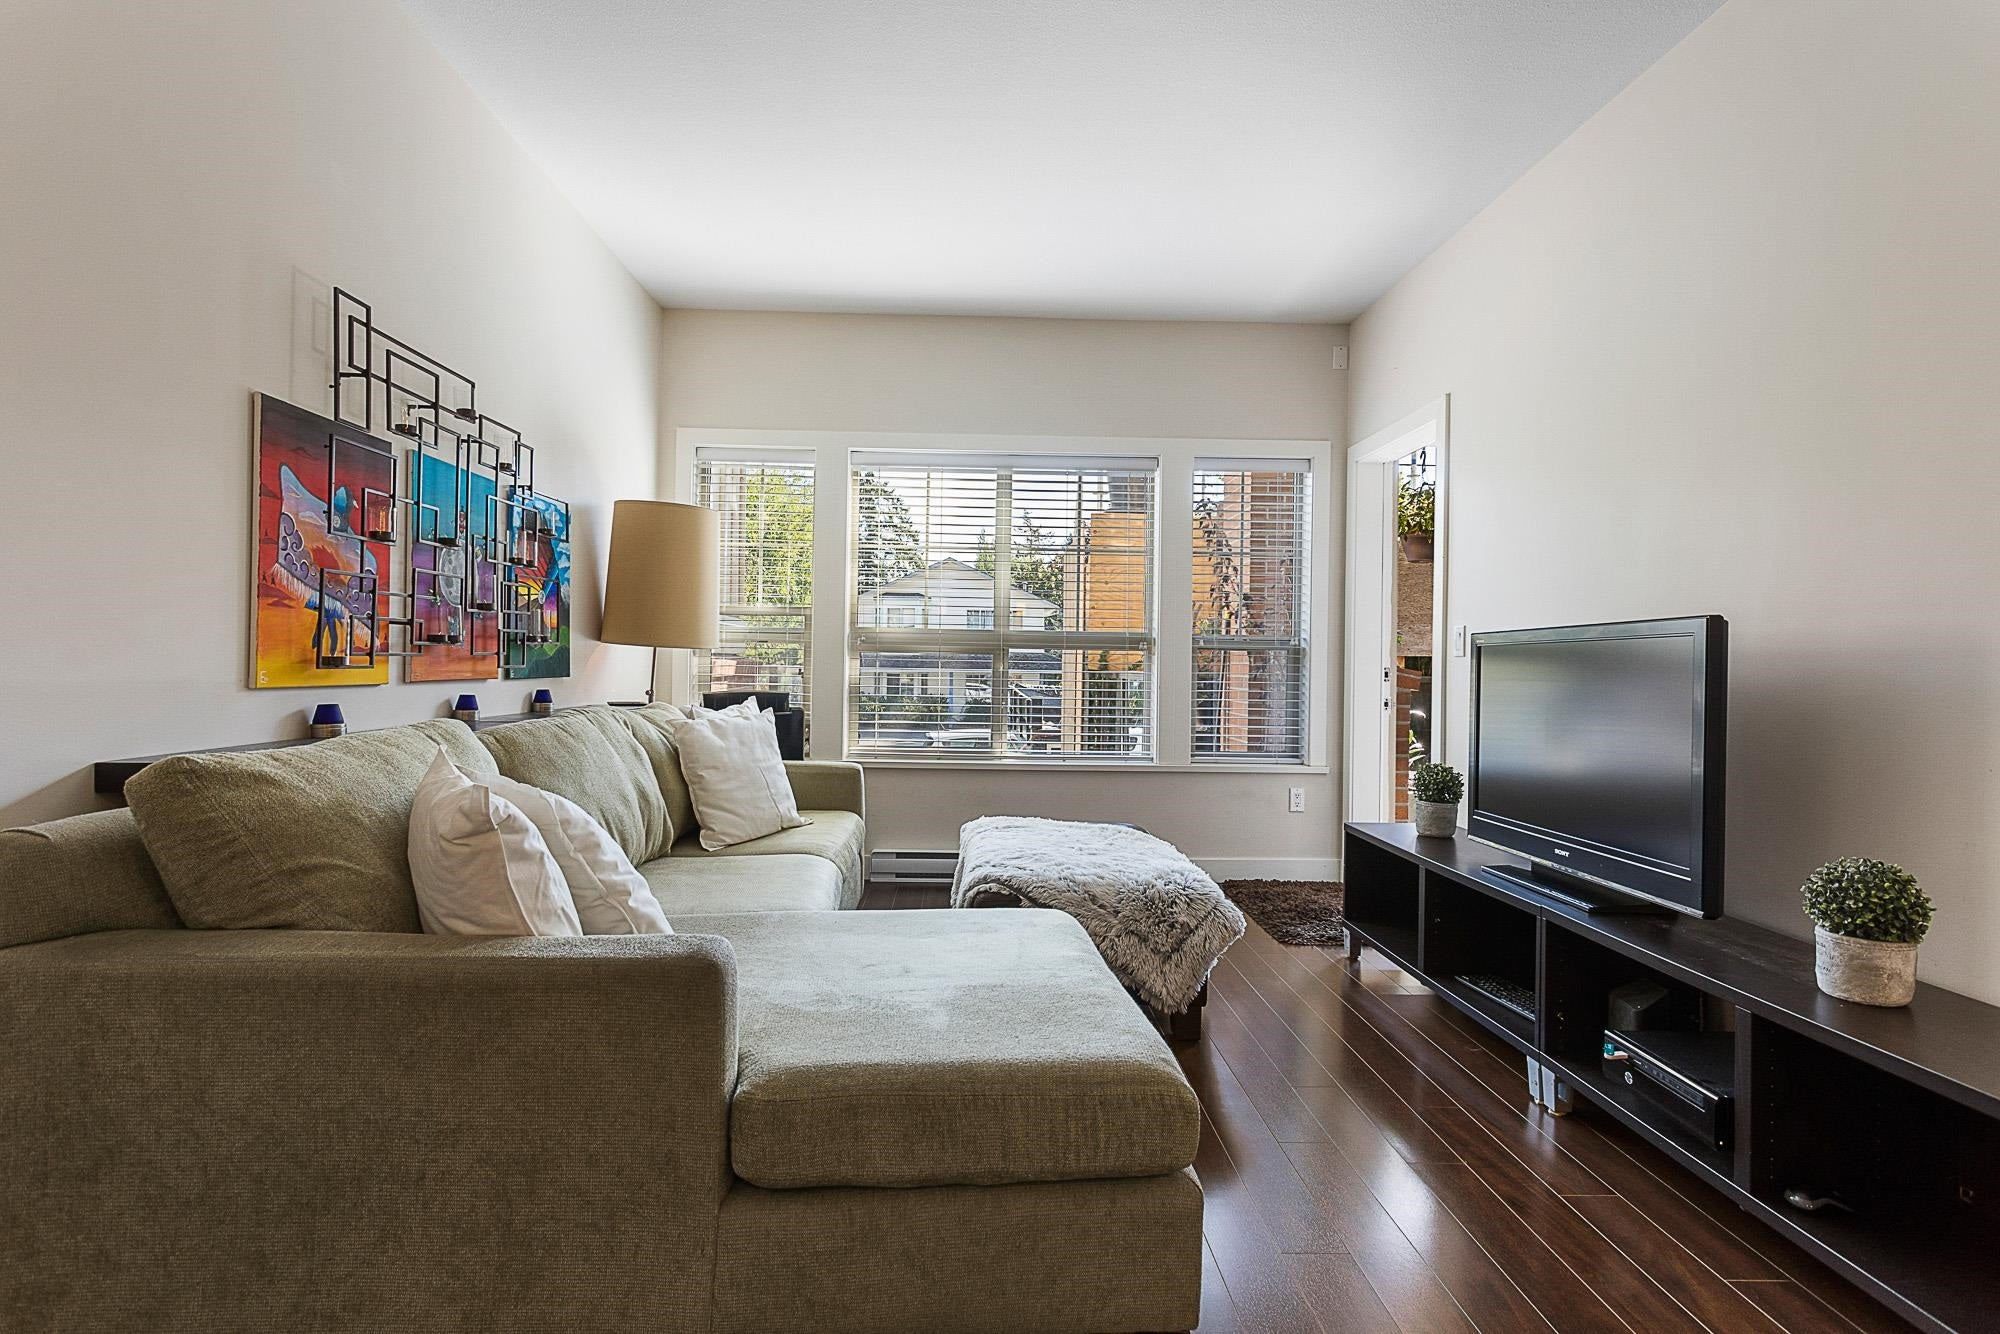 114 20219 54A AVENUE - Langley City Apartment/Condo for sale, 1 Bedroom (R2616172) - #14